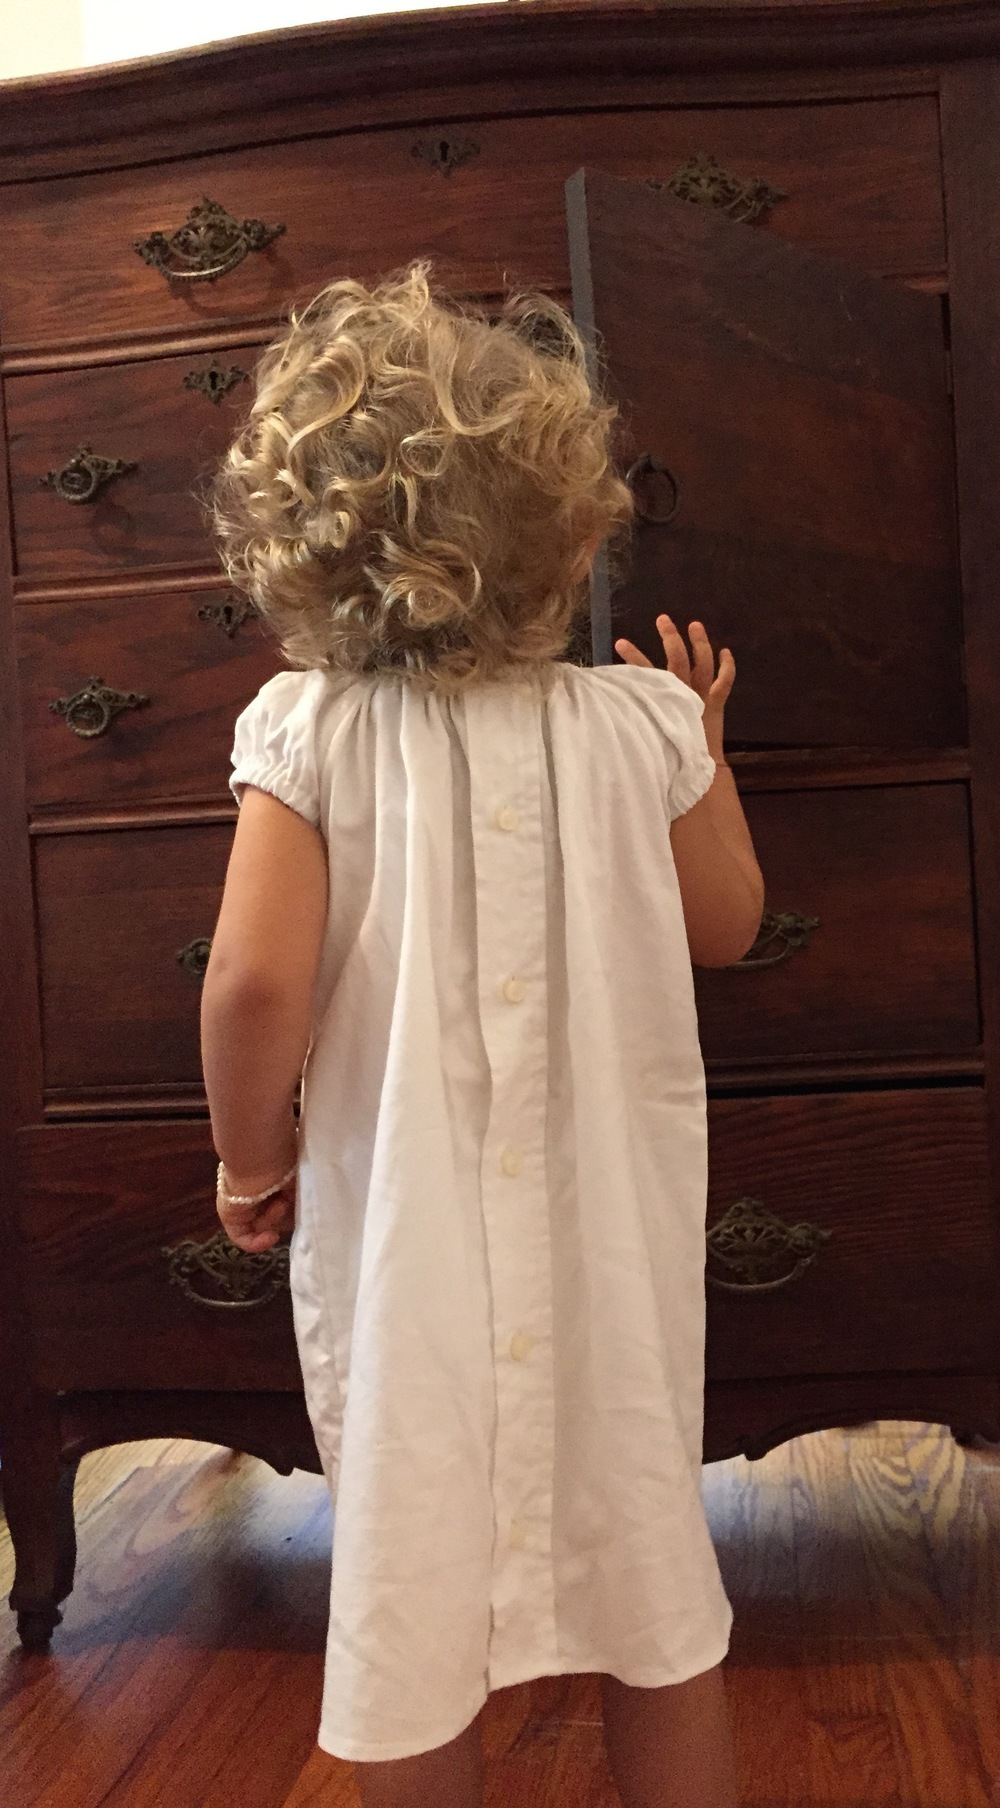 DIY-Shirt turned into dress-9.jpg